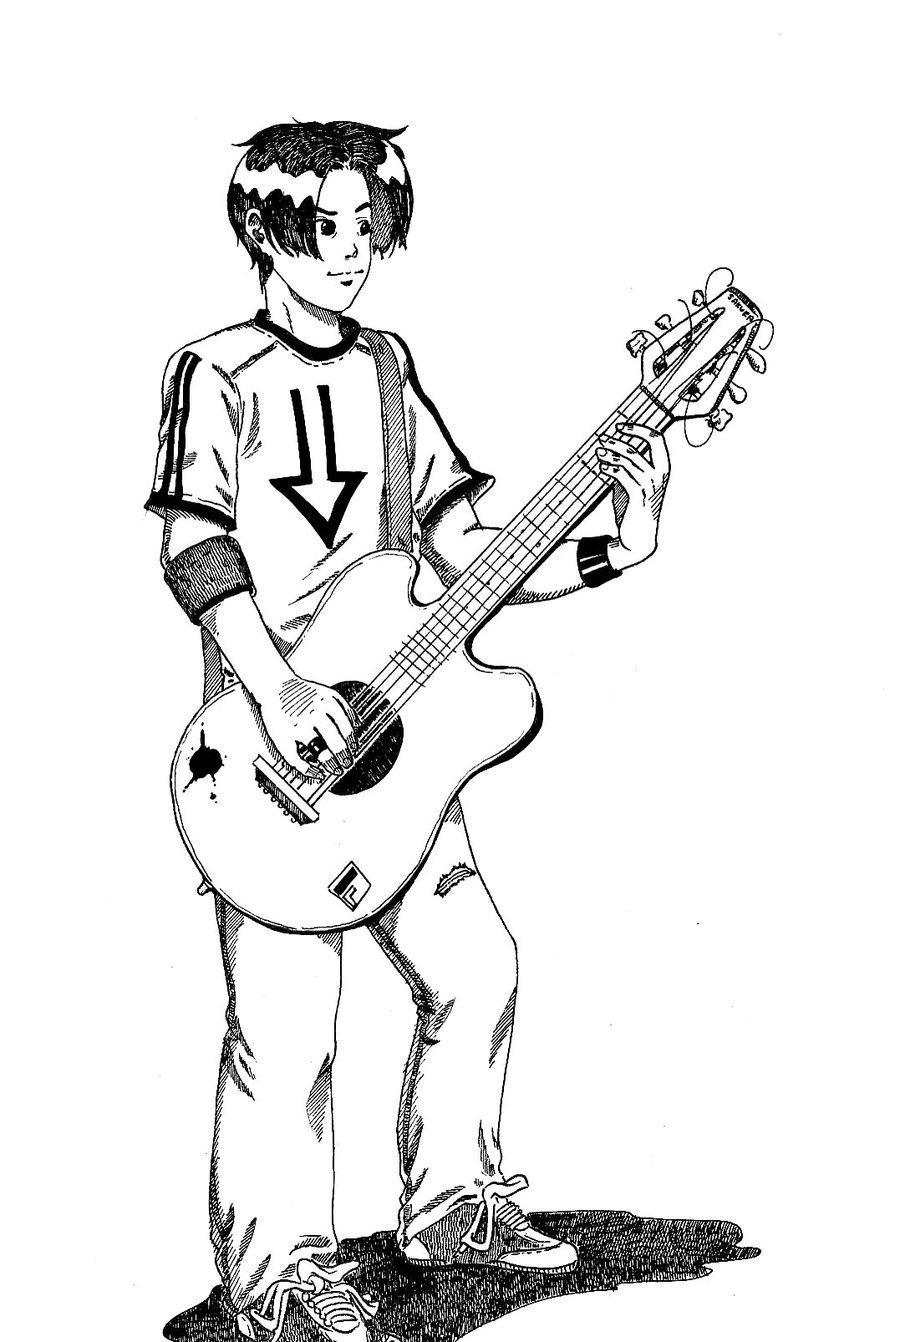 900x1342 Cute Boy Sketch With Guitar Cute Boy Sketch With Guitar Guitar